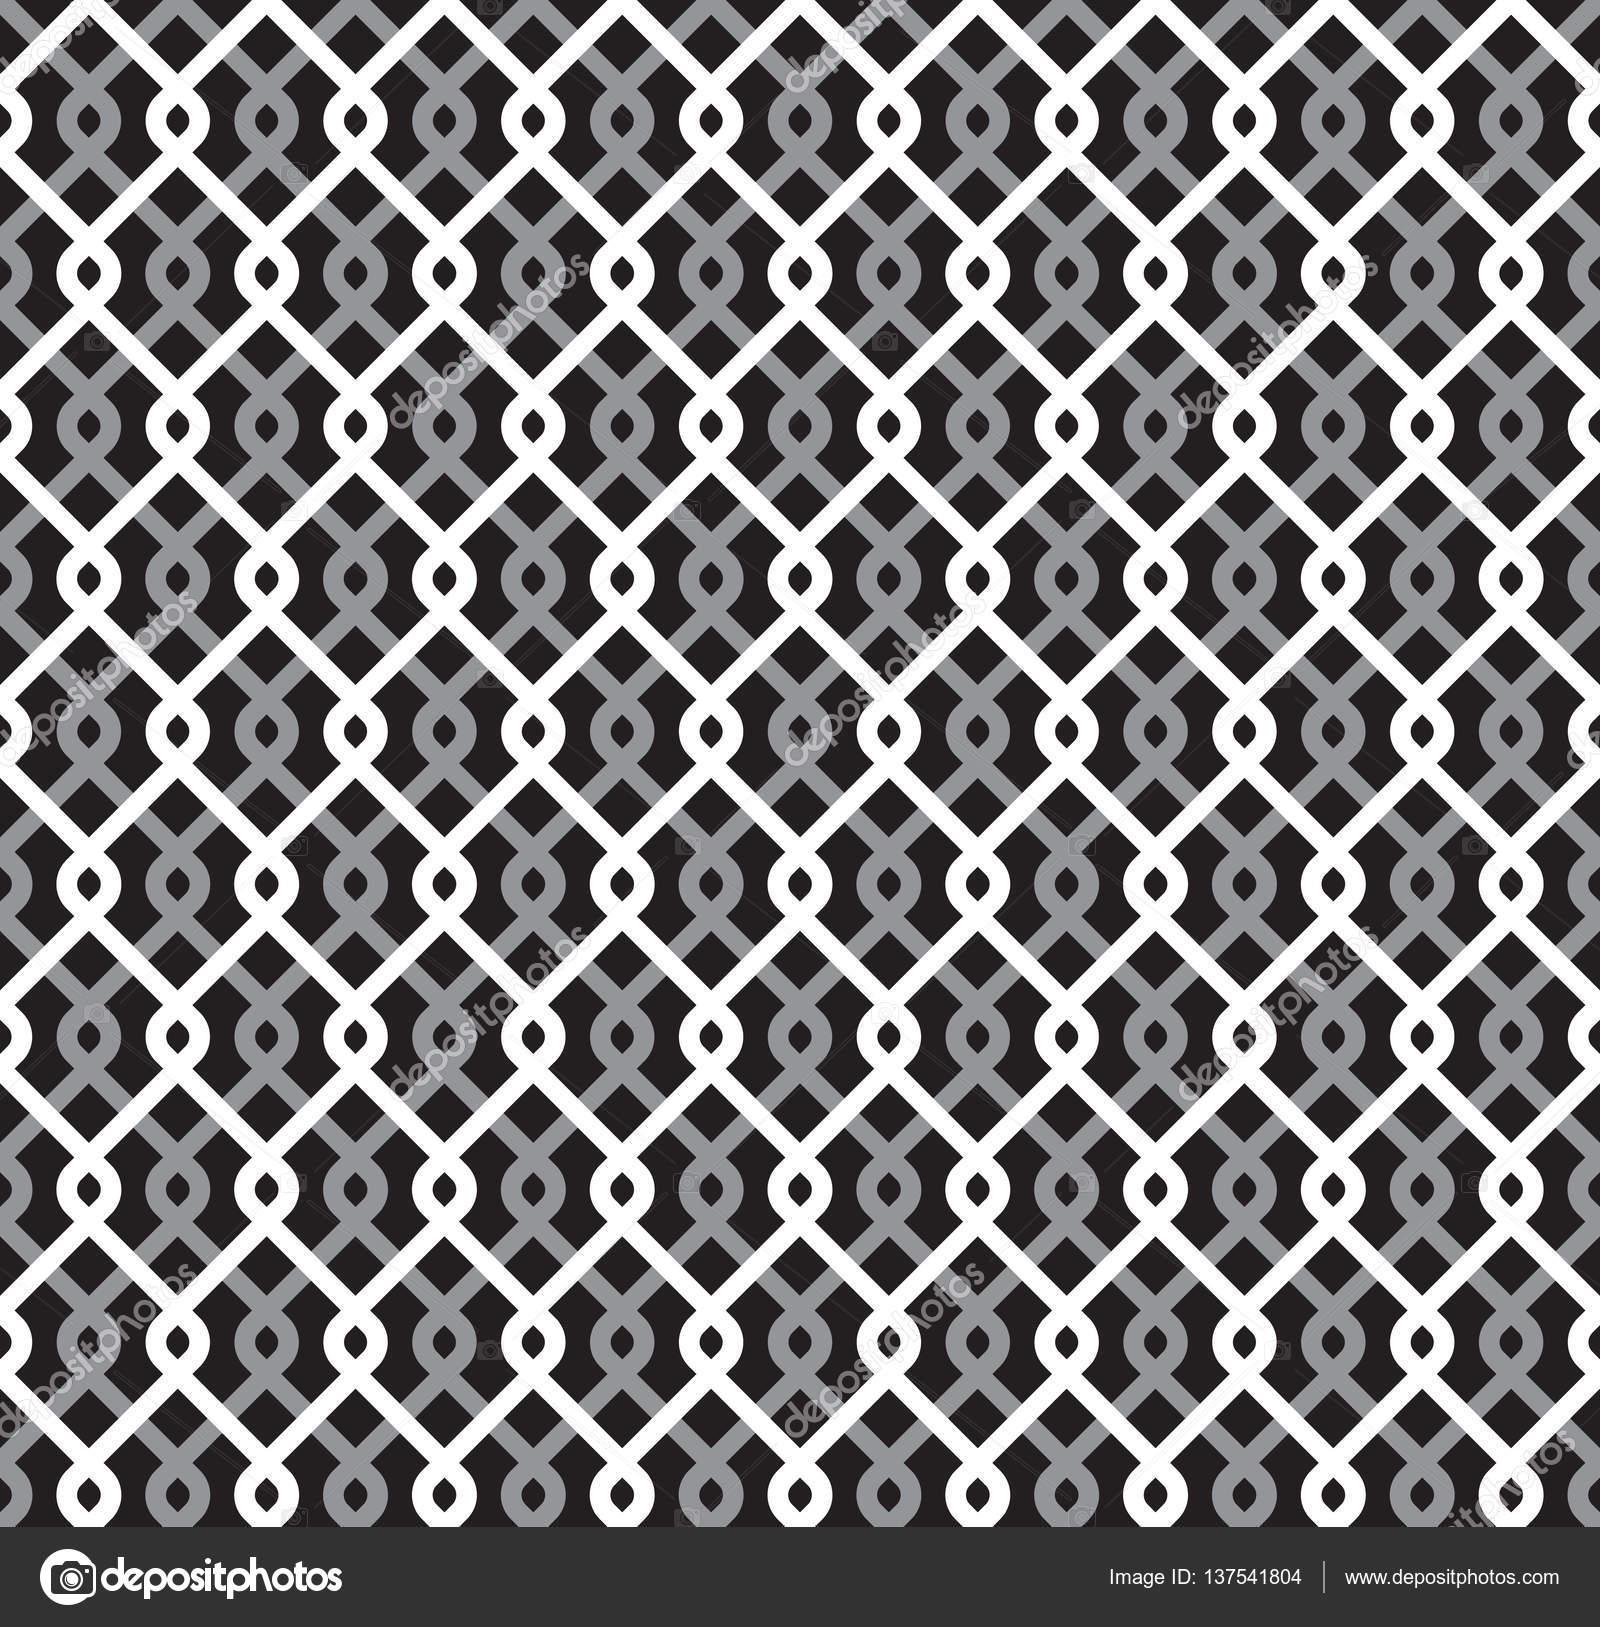 Kabelgebundene metallischen Zaun nahtlose Muster — Stockvektor ...